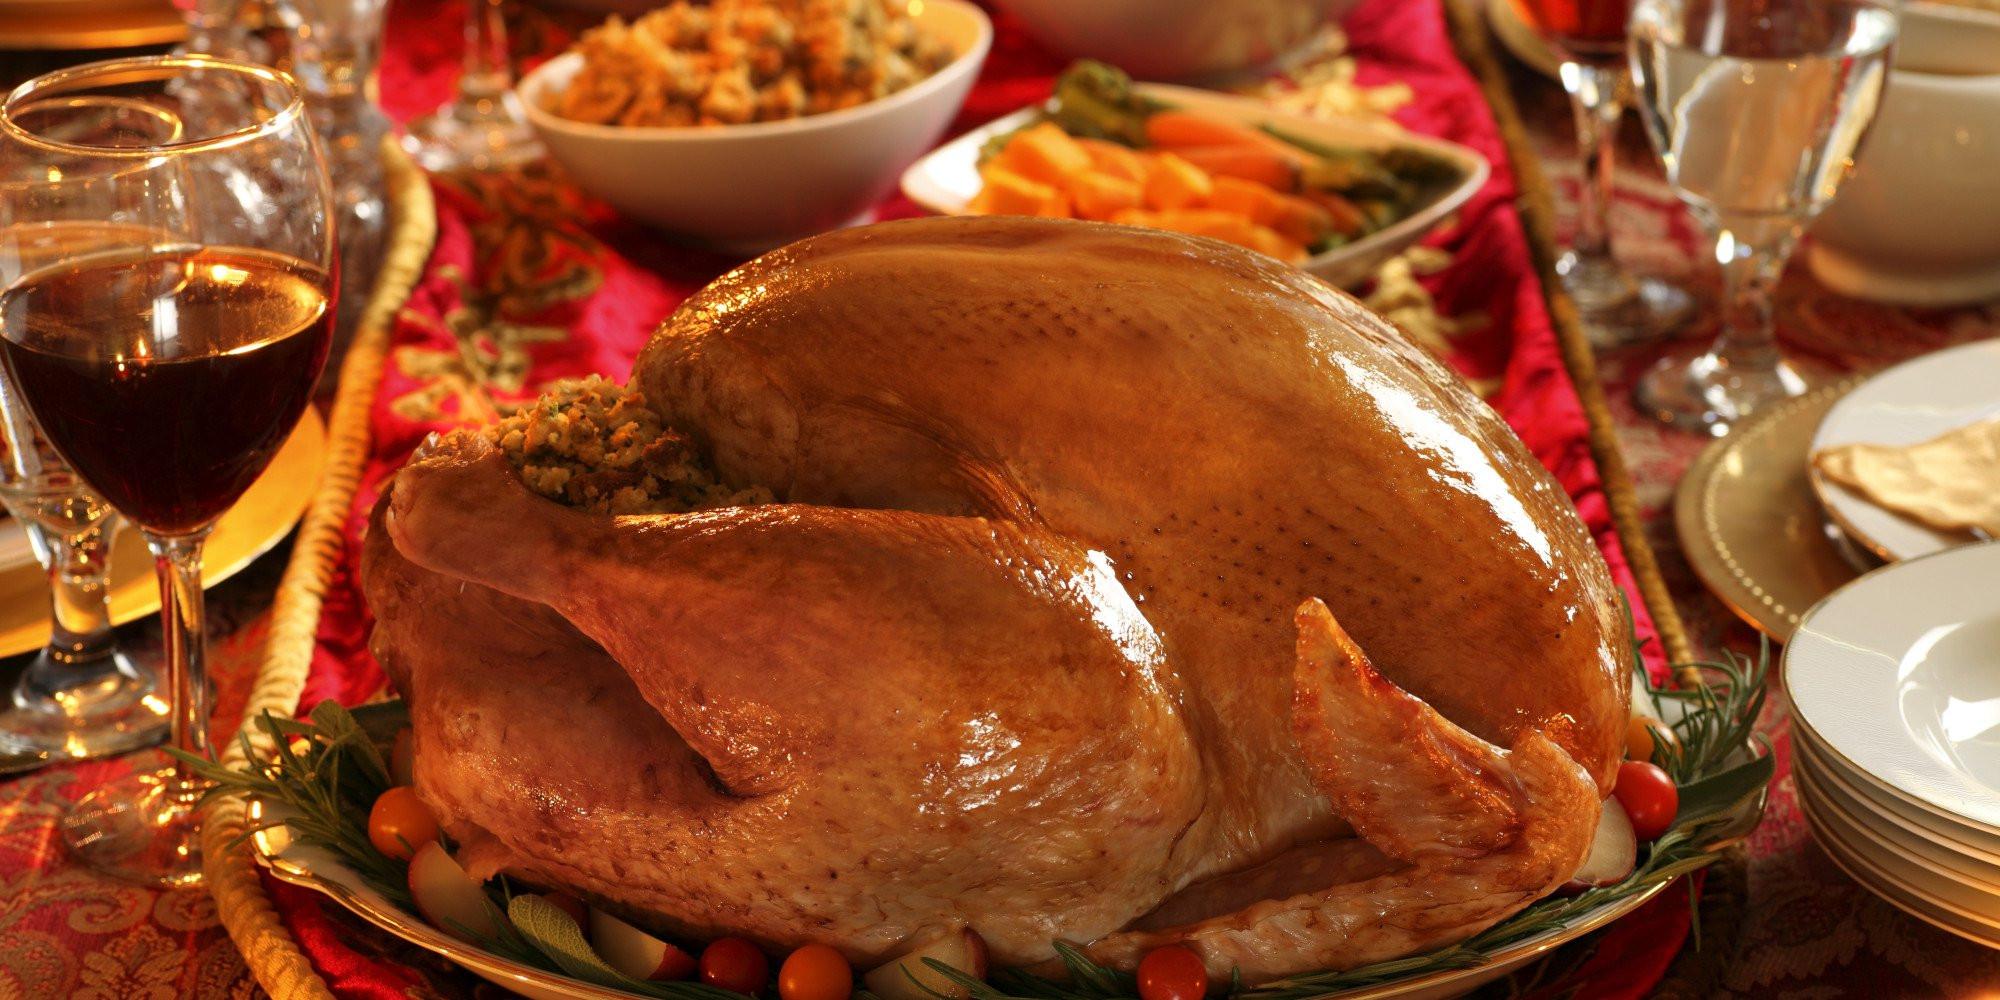 Restaurants Serving Thanksgiving Dinner  Can't Cook R4L s Top 5 Restaurants Serving Thanksgiving